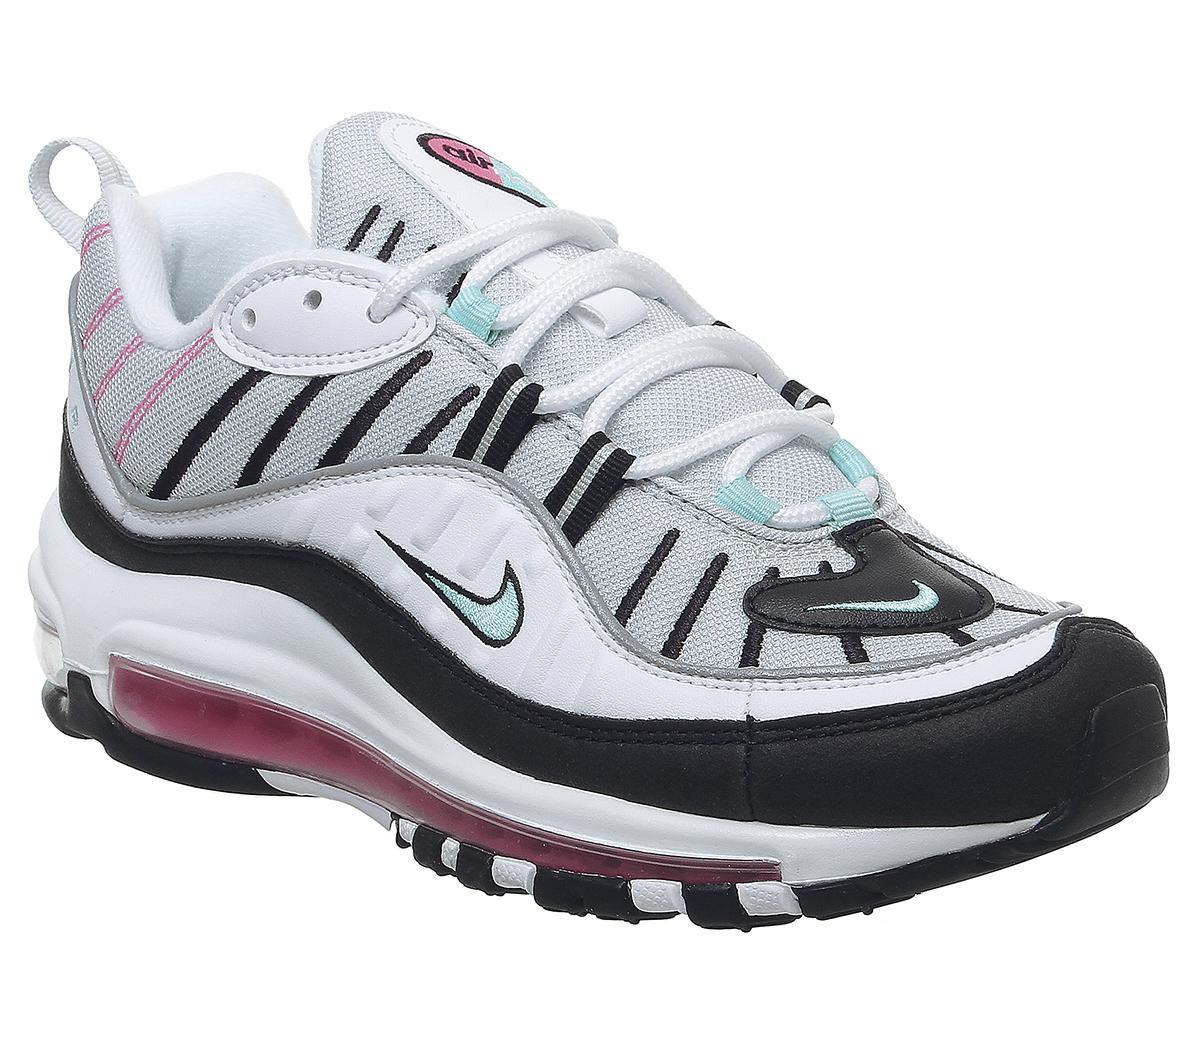 Nike Air Max 98 Trainers Pure Platinum